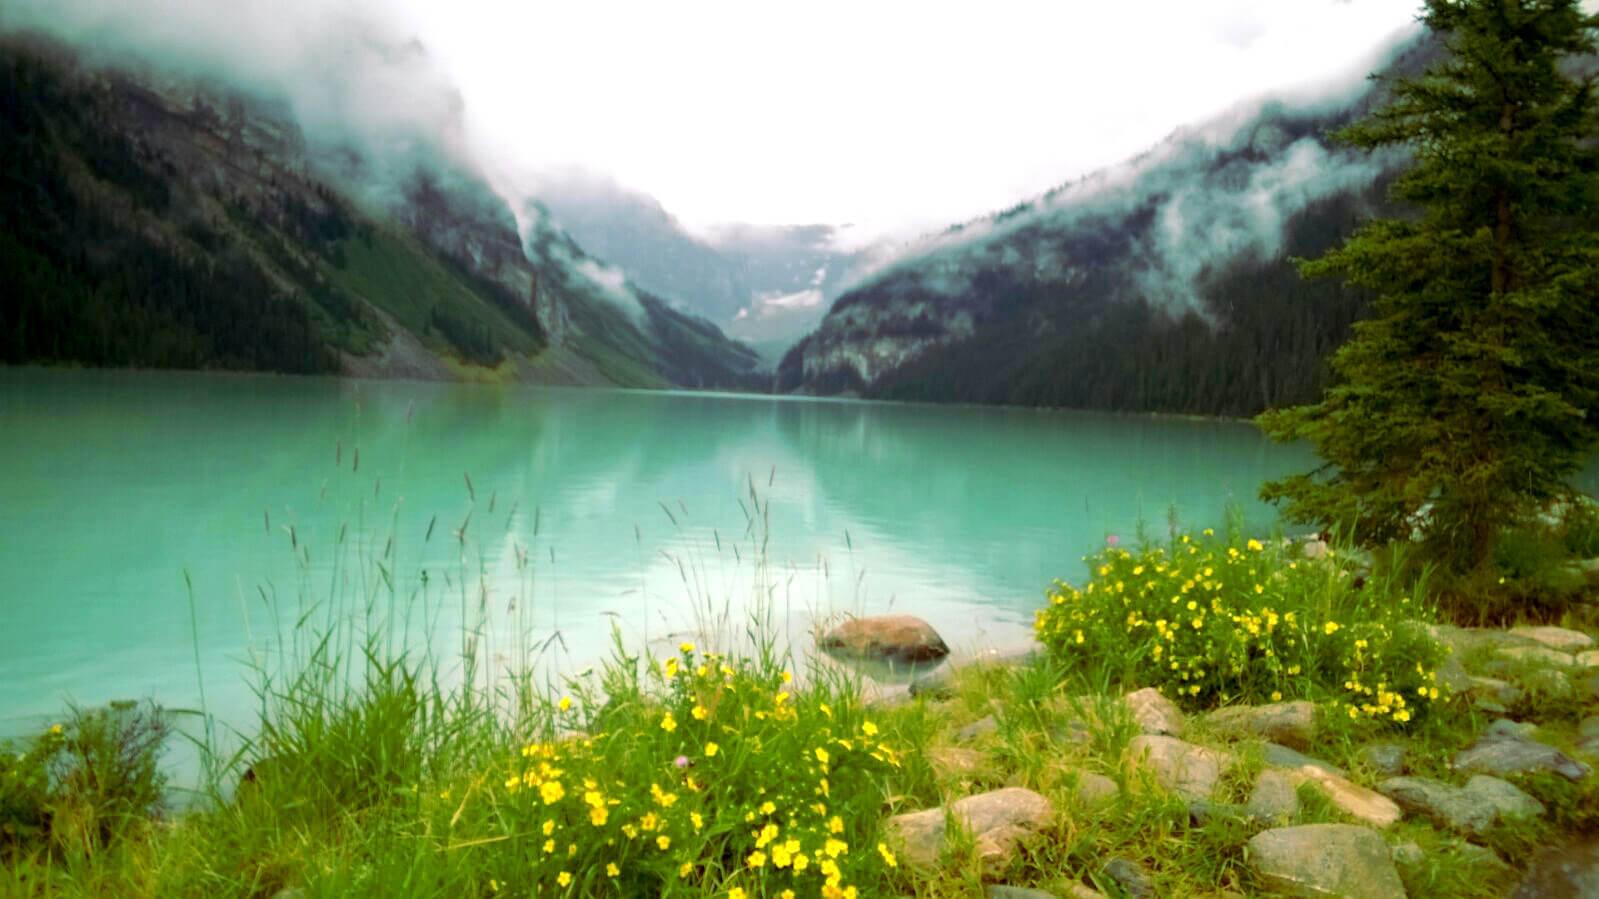 The Best Way To Enjoy Lake Louise - Hike to Lake Agnes Tea House - Traveling Pari